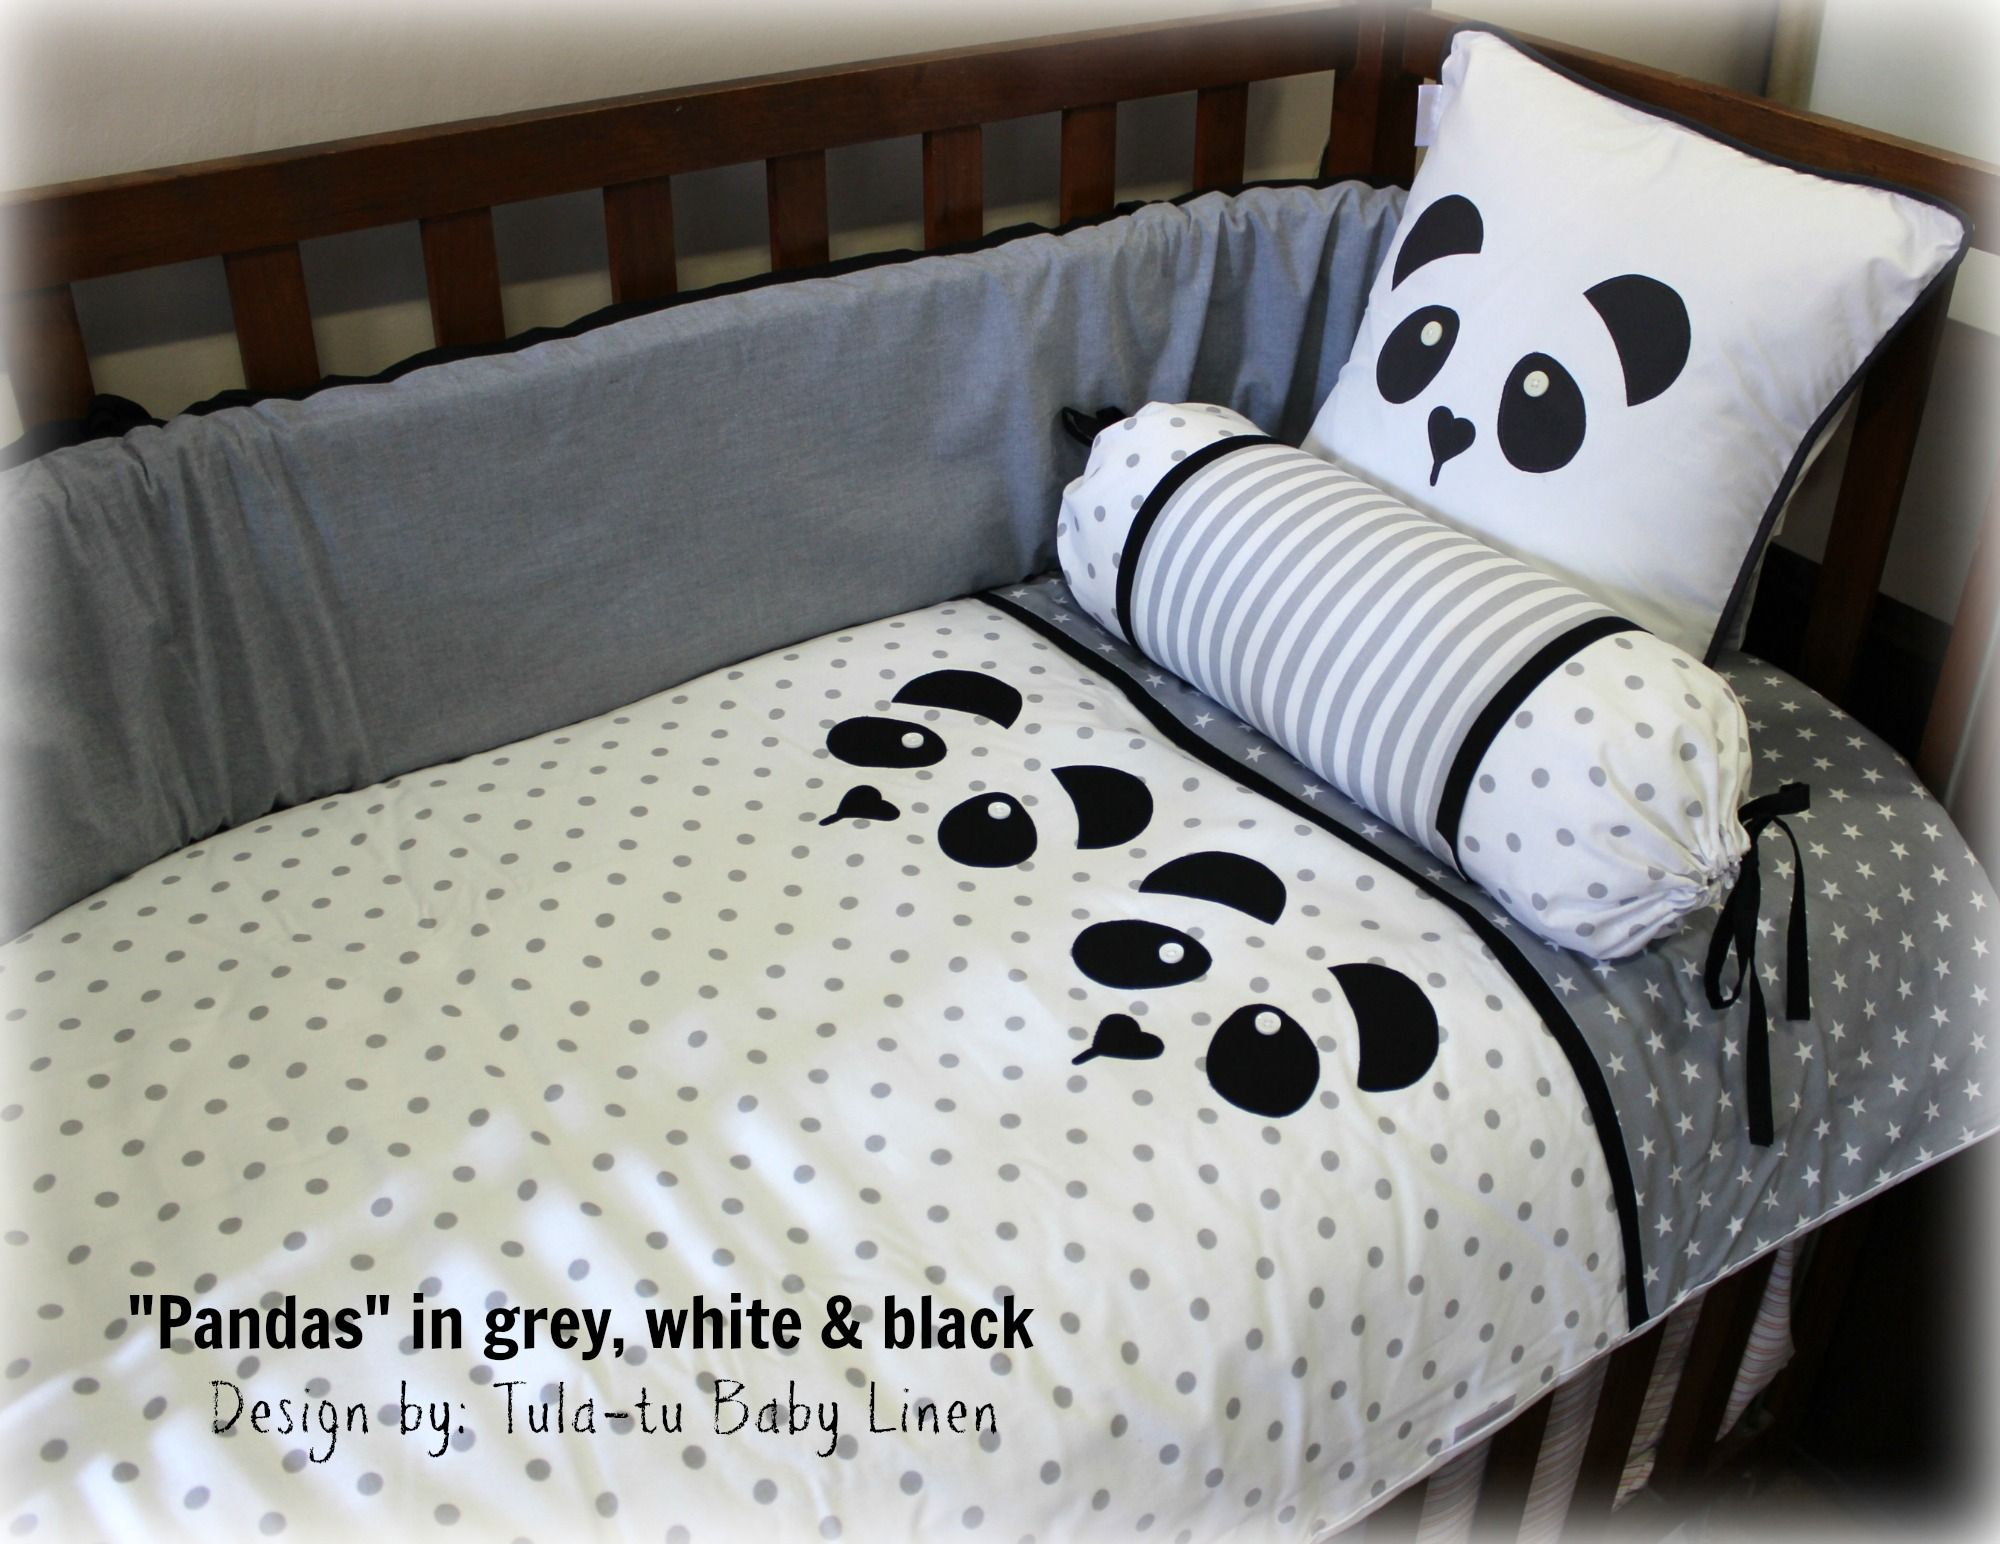 Panda Themed Nursery Linen In Black White Grey Made To Order